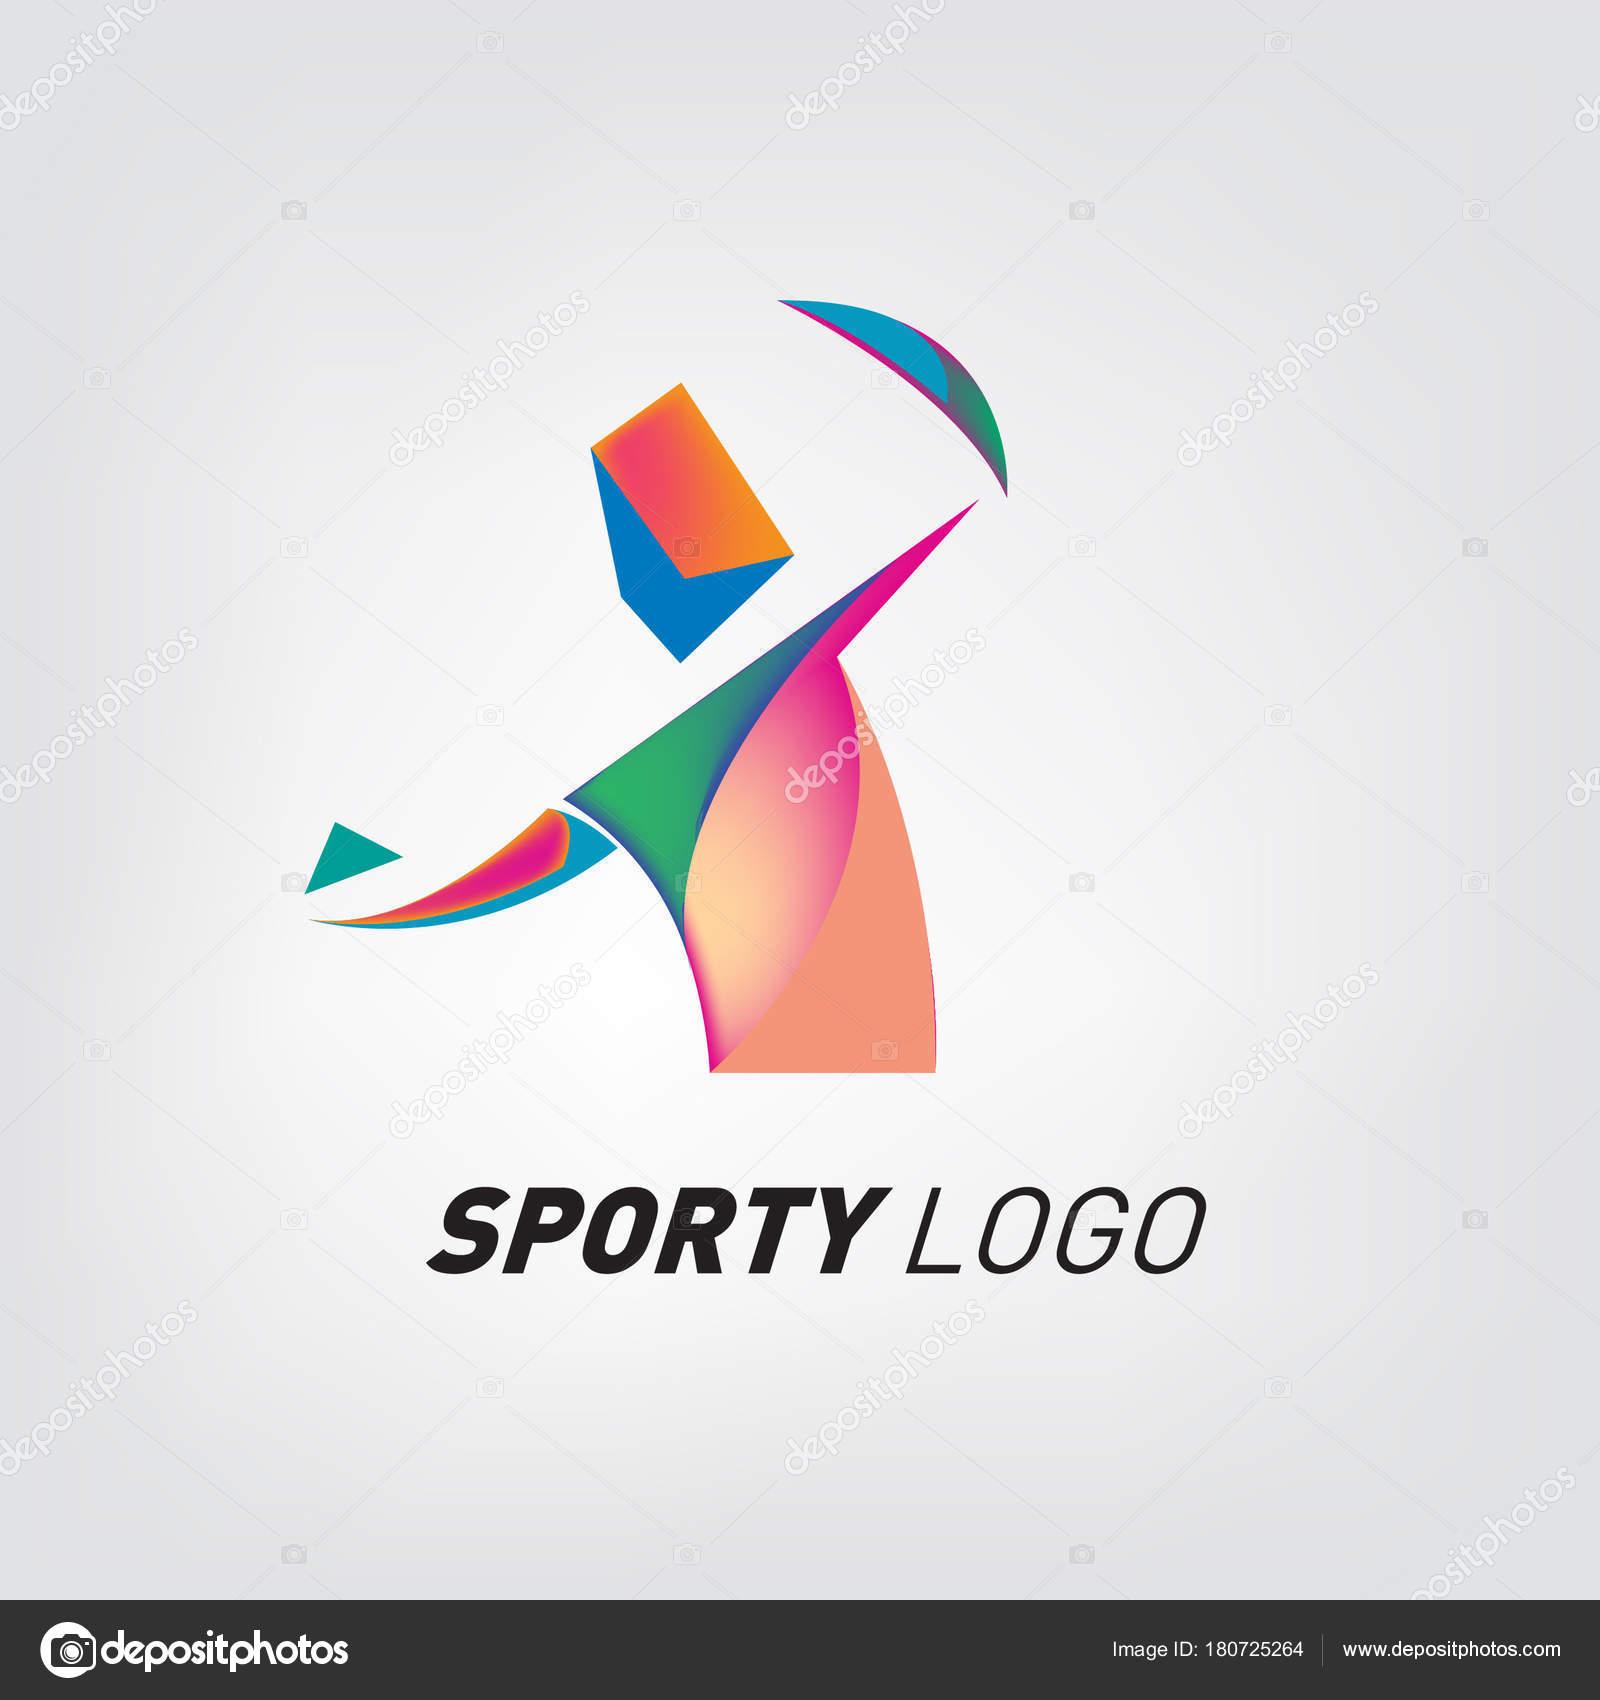 Logotipo De Juegos Deportivos Deporte Dinamico Colorido Logo Icono